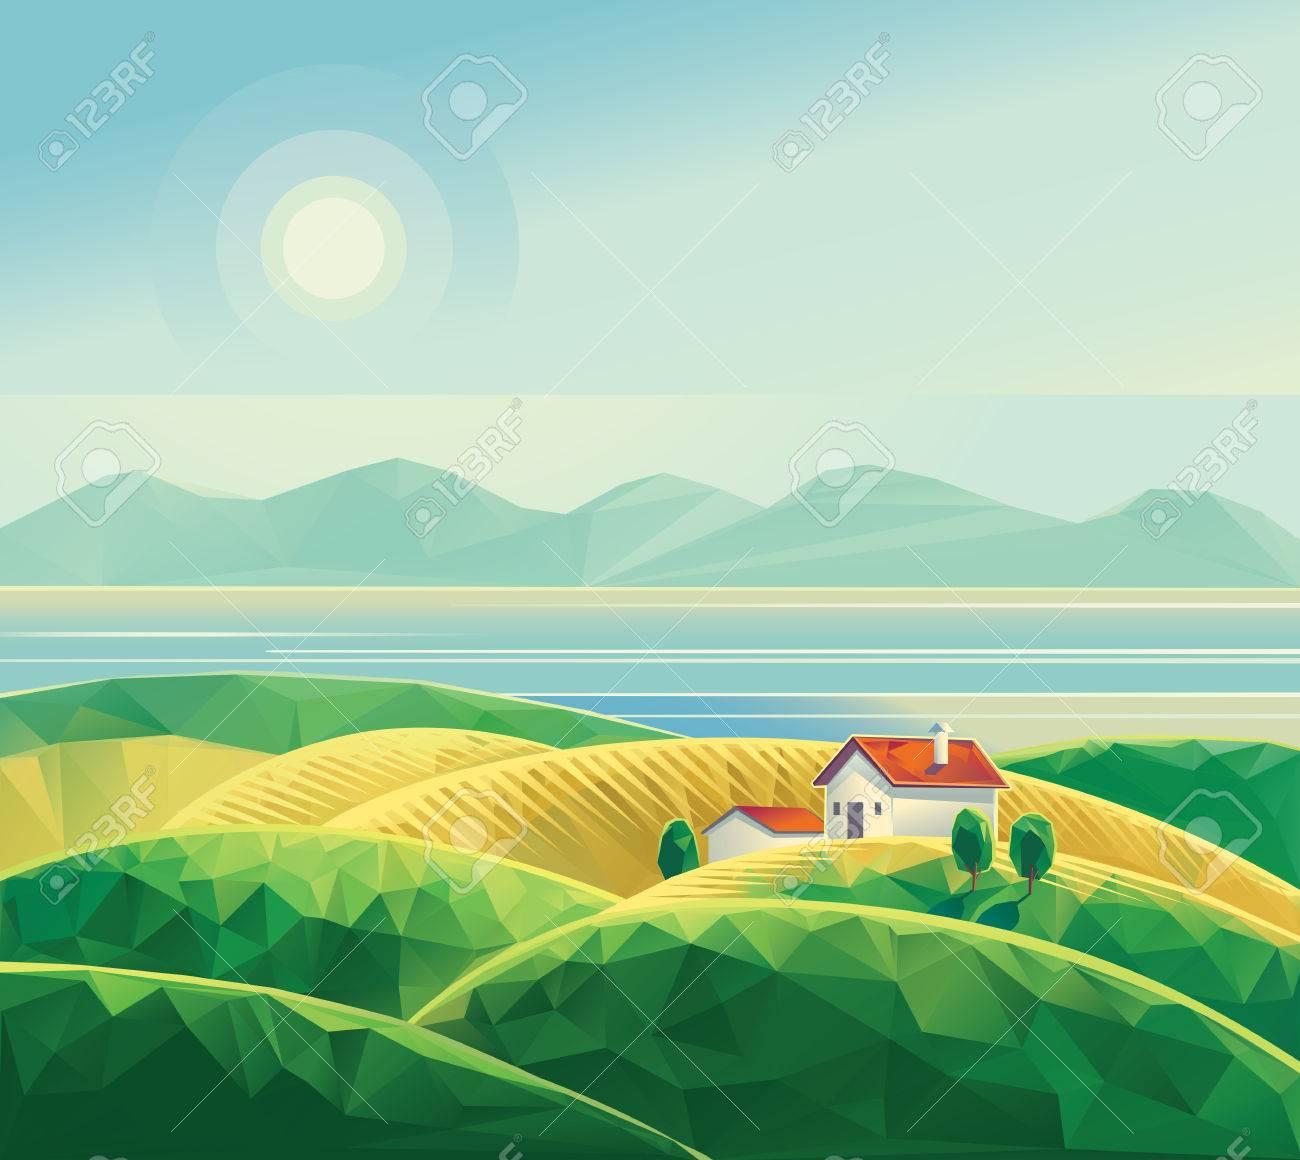 Landscape with hut. Polygon illustration vector. - 51689272